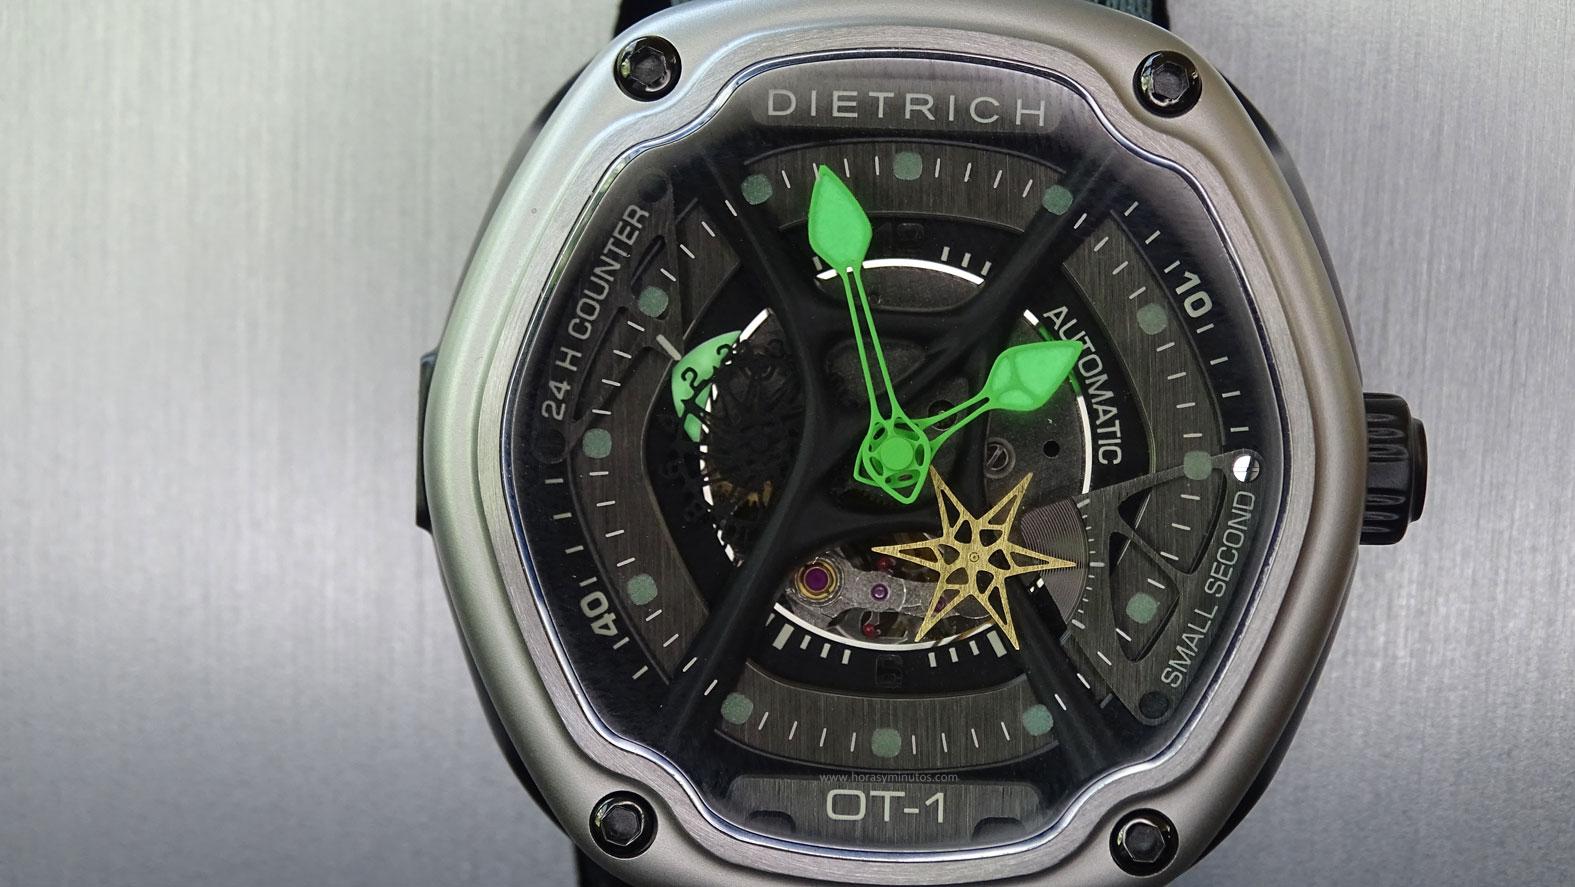 Dietrich OT 1 frontal